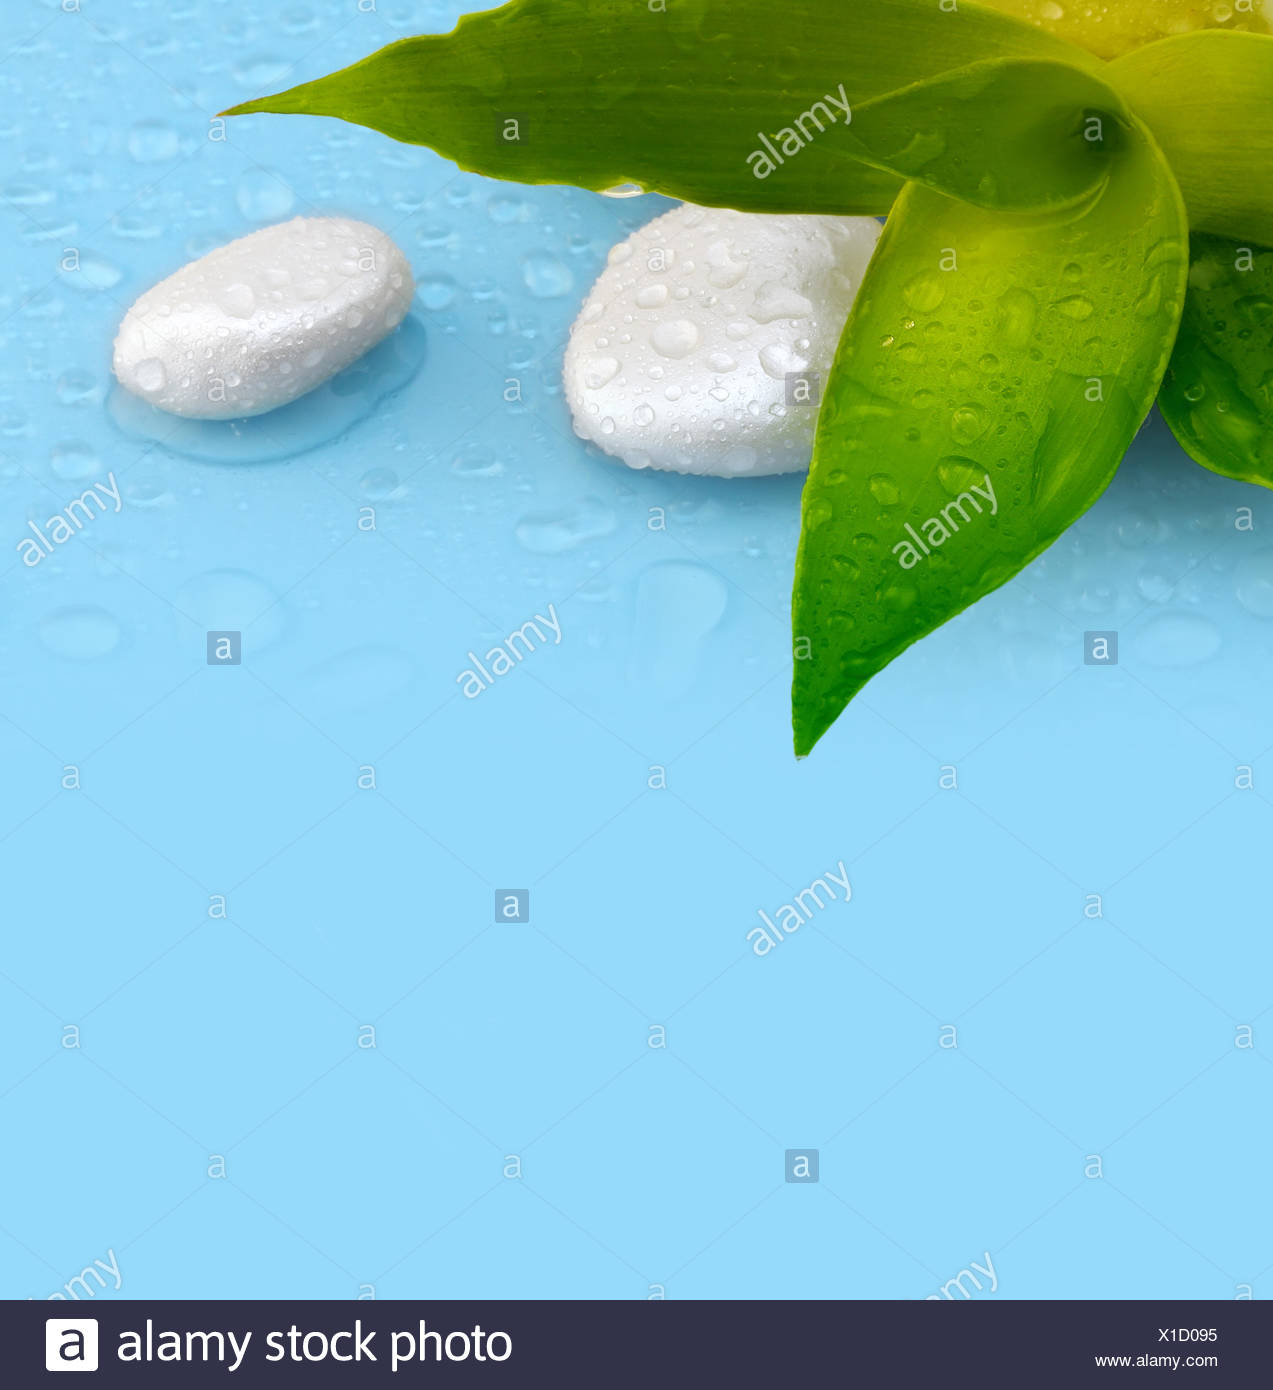 Leaf Health Eco Stone Rock Drop Wet Balance Stack